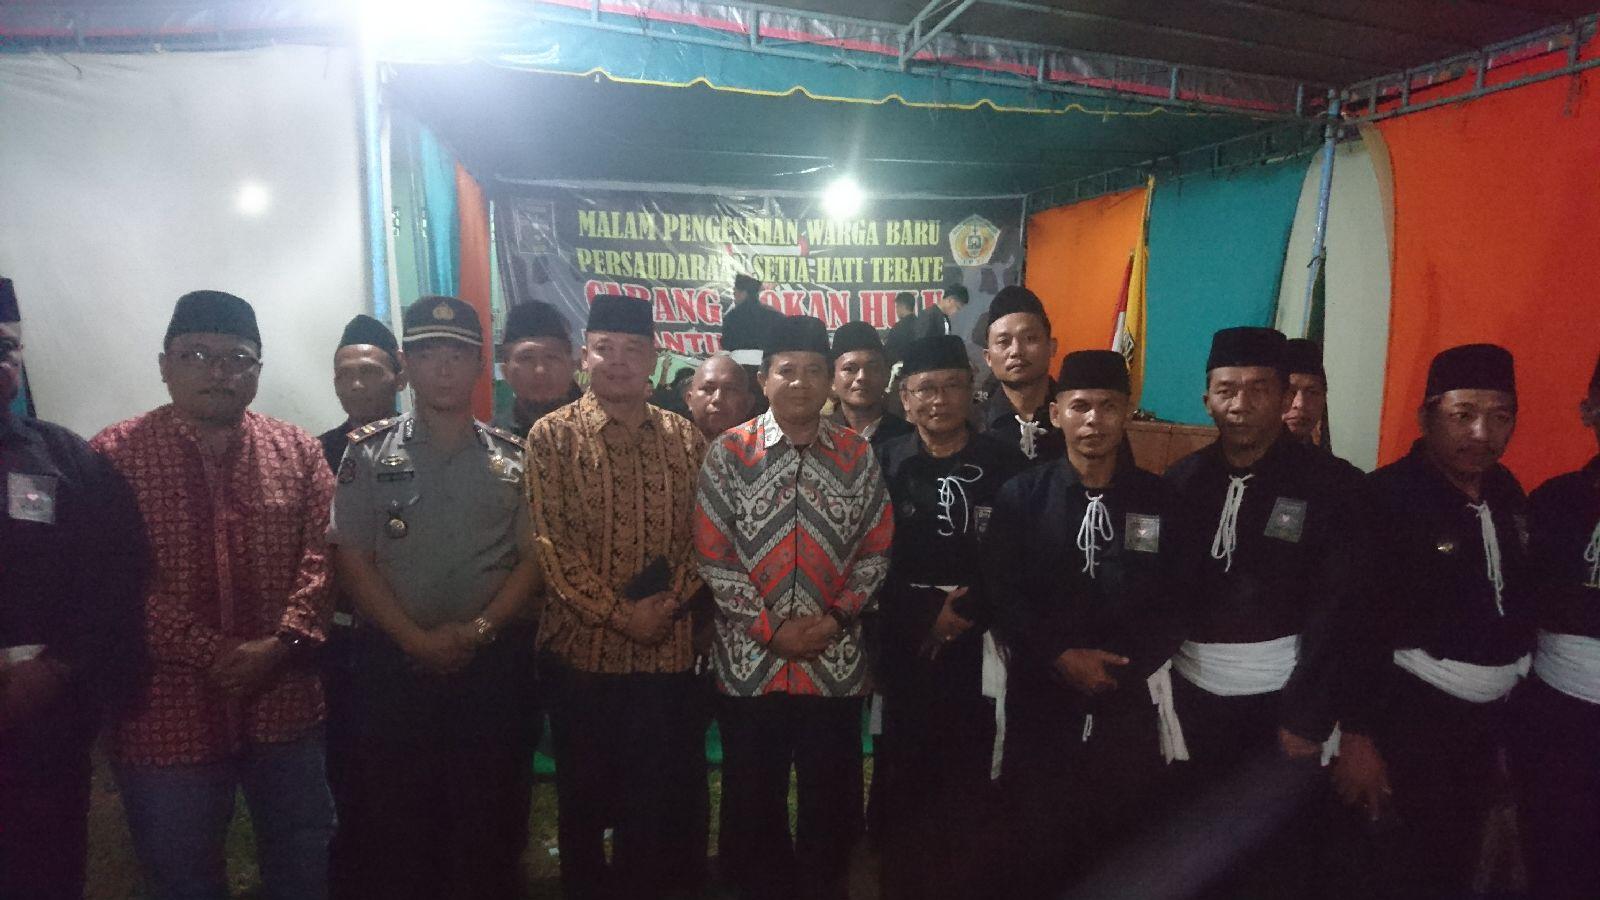 Pj Sekda Rohul hadiri pengesahan warga baru PSHT.